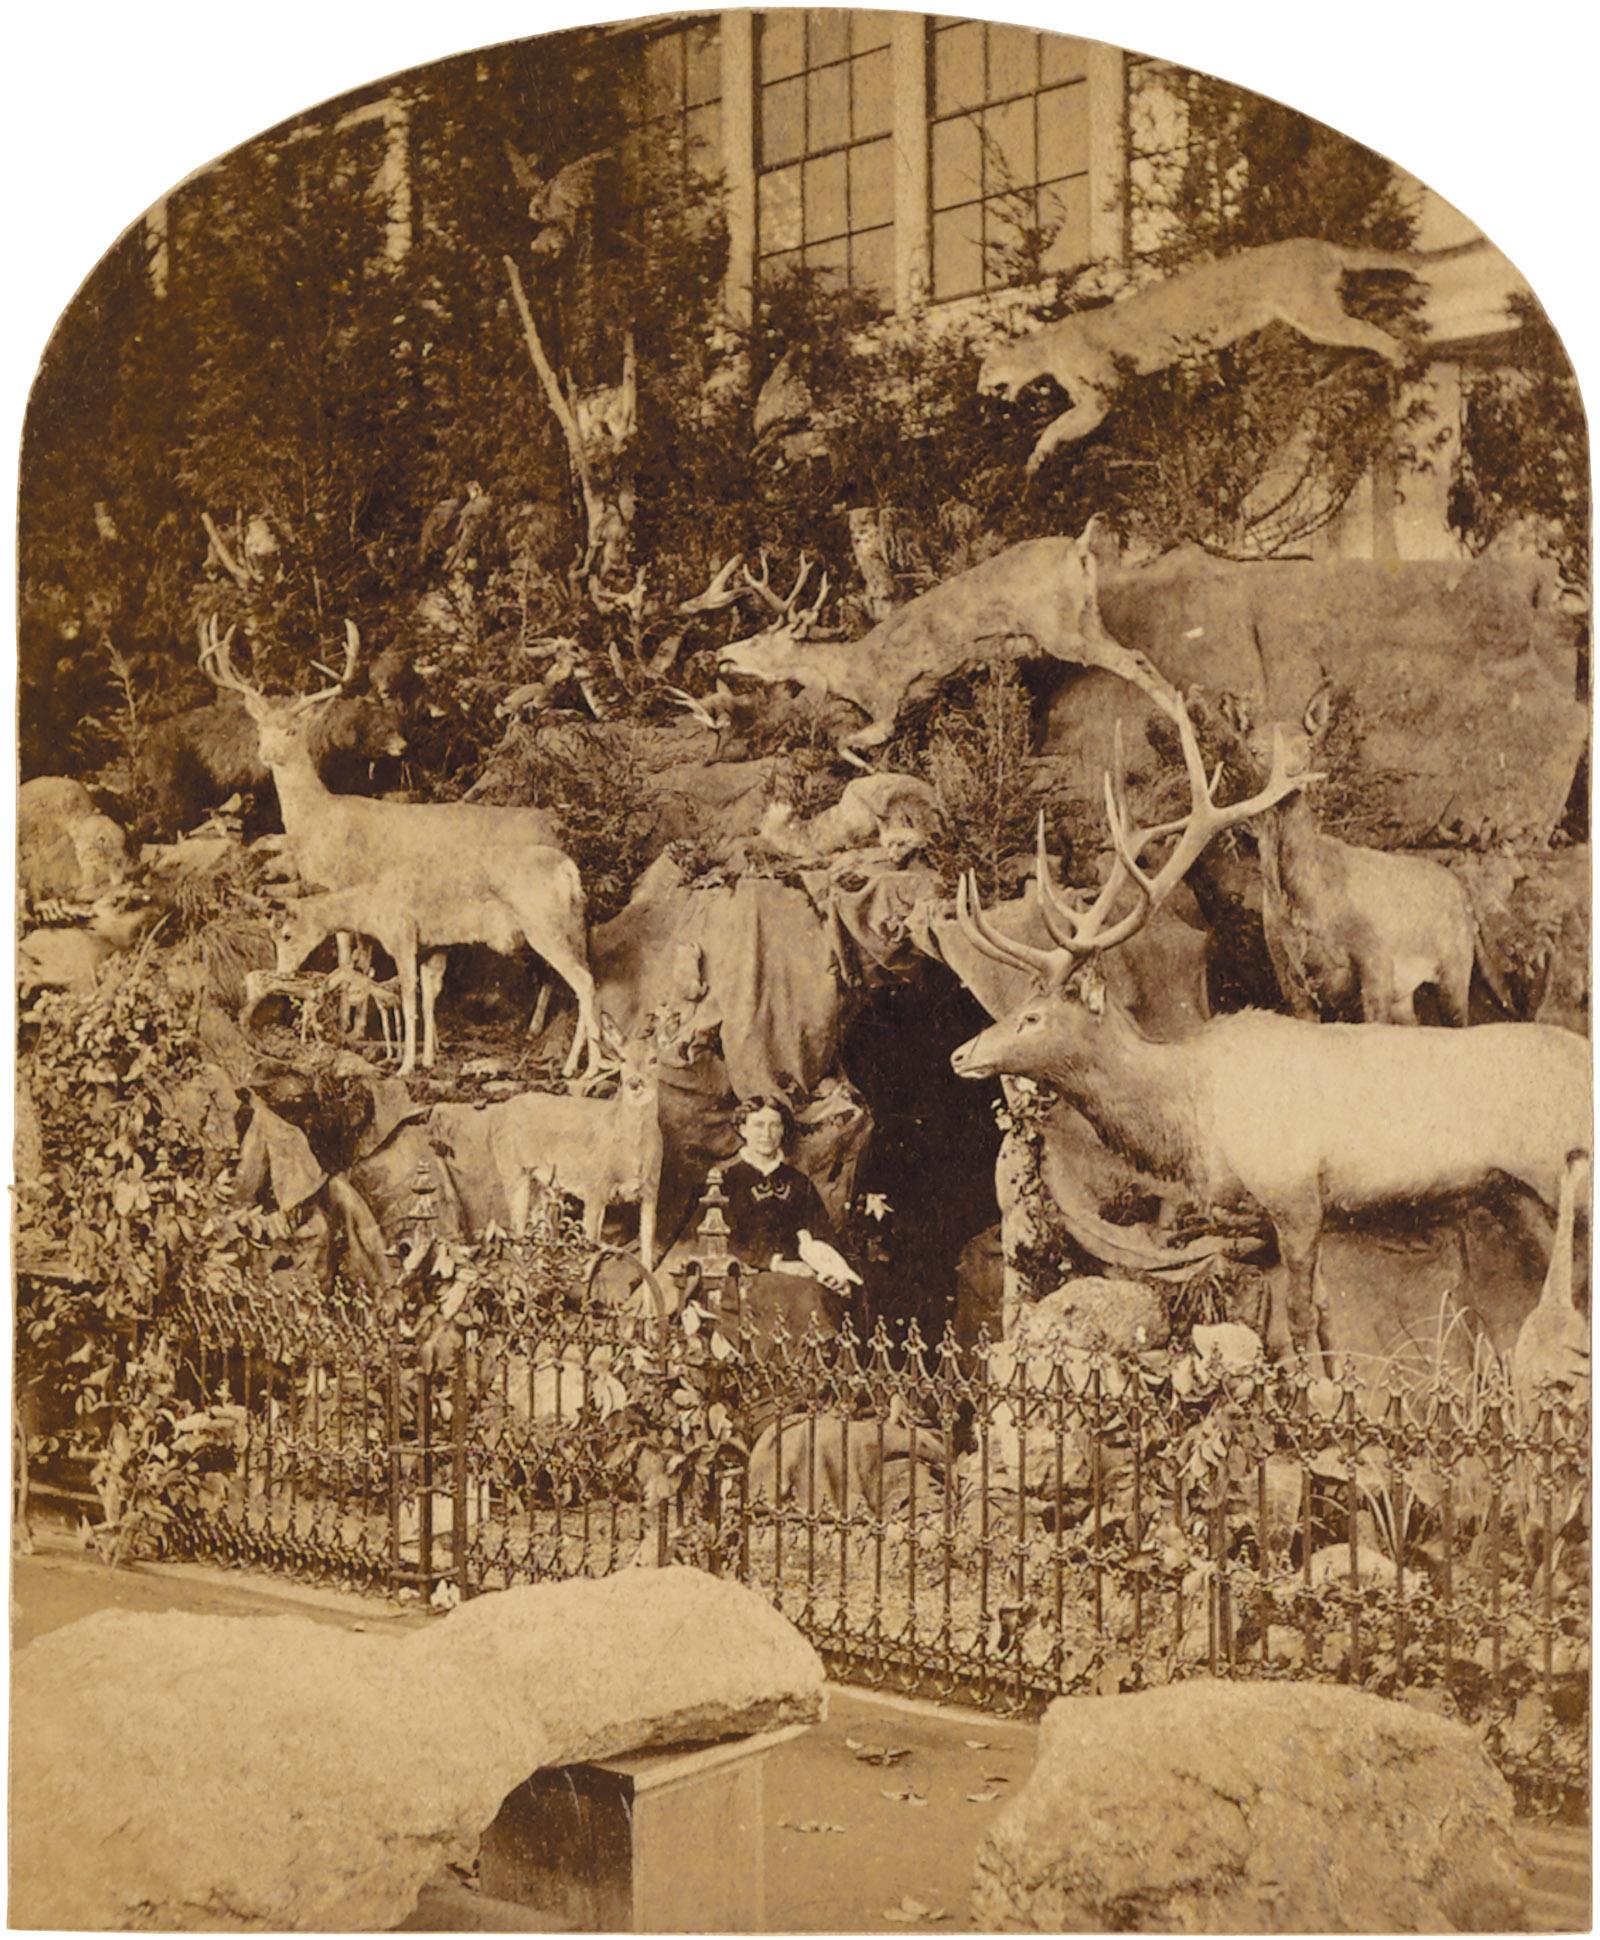 A stereographic souvenir card showing a display of showing a display of the naturalist Martha Maxwell's wildlife specimens